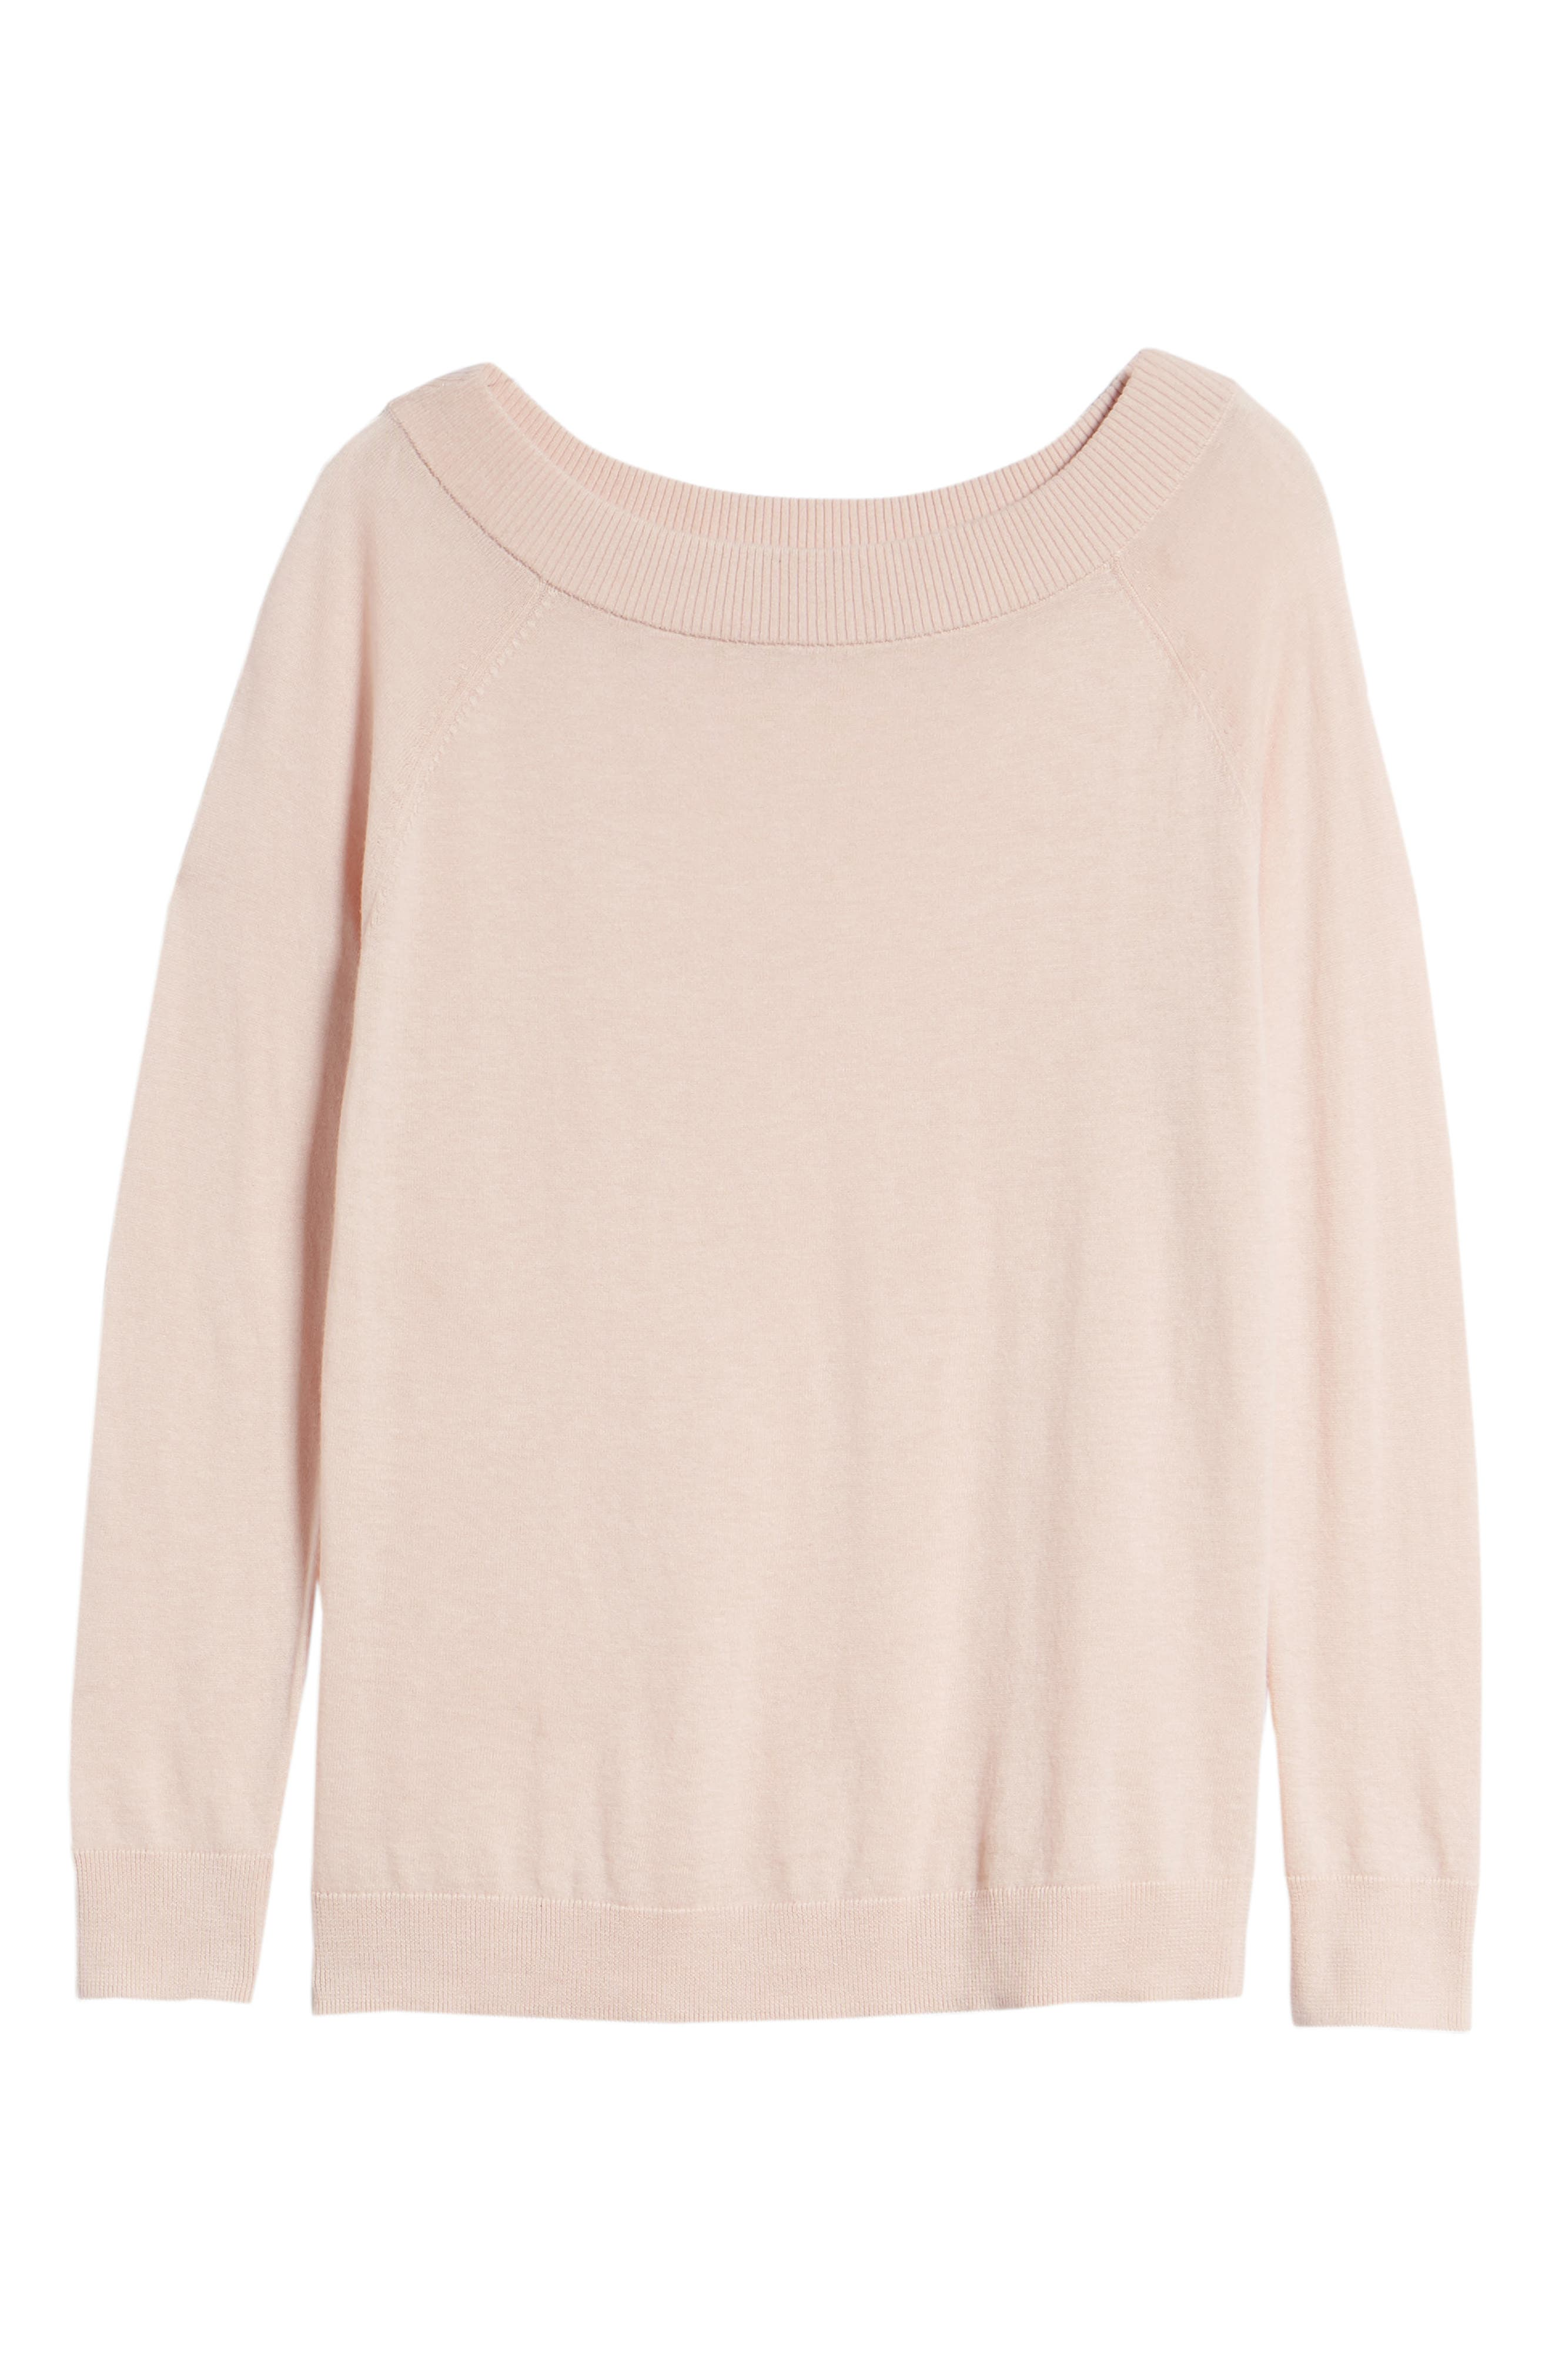 Convertible Bateau Neck Sweater,                             Alternate thumbnail 6, color,                             Pink Peach